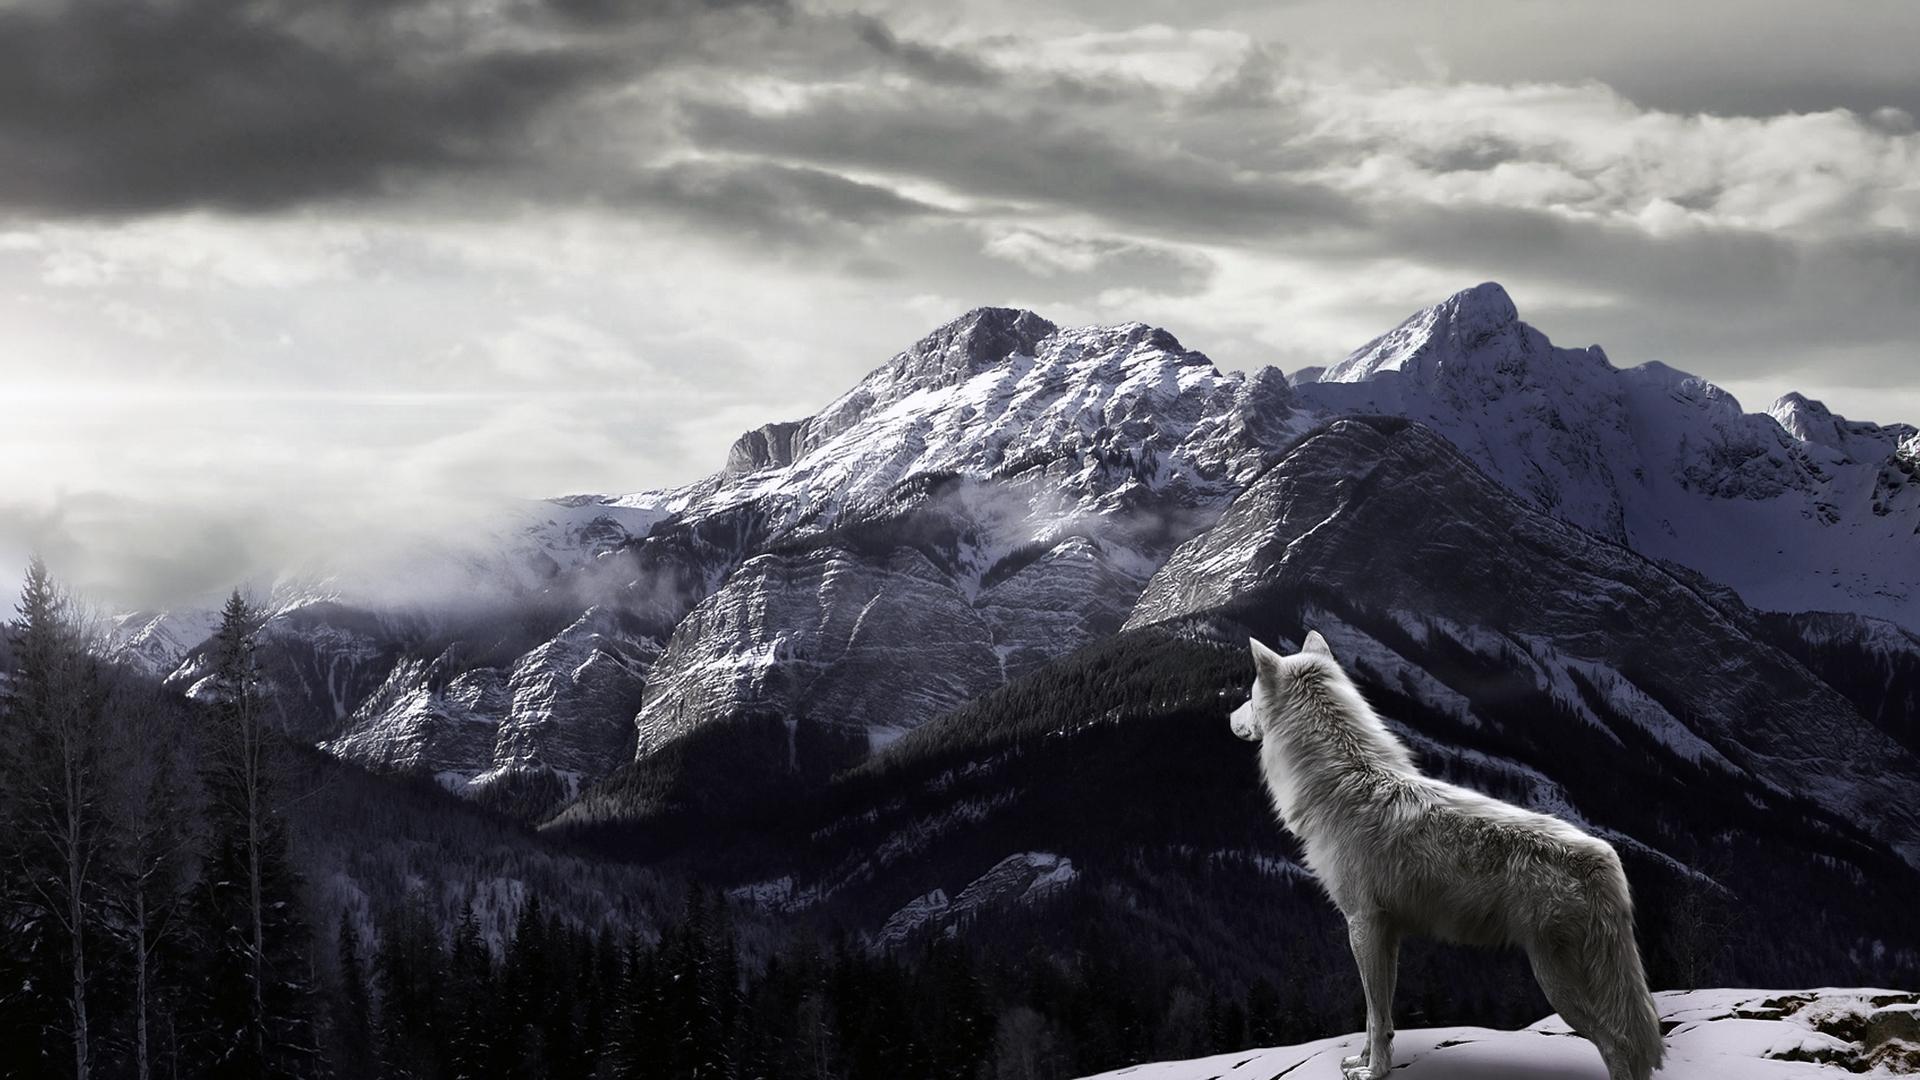 Hình ảnh HD 1920x1080 Wolf Wallpaper - One HD Wallpaper Picture Background